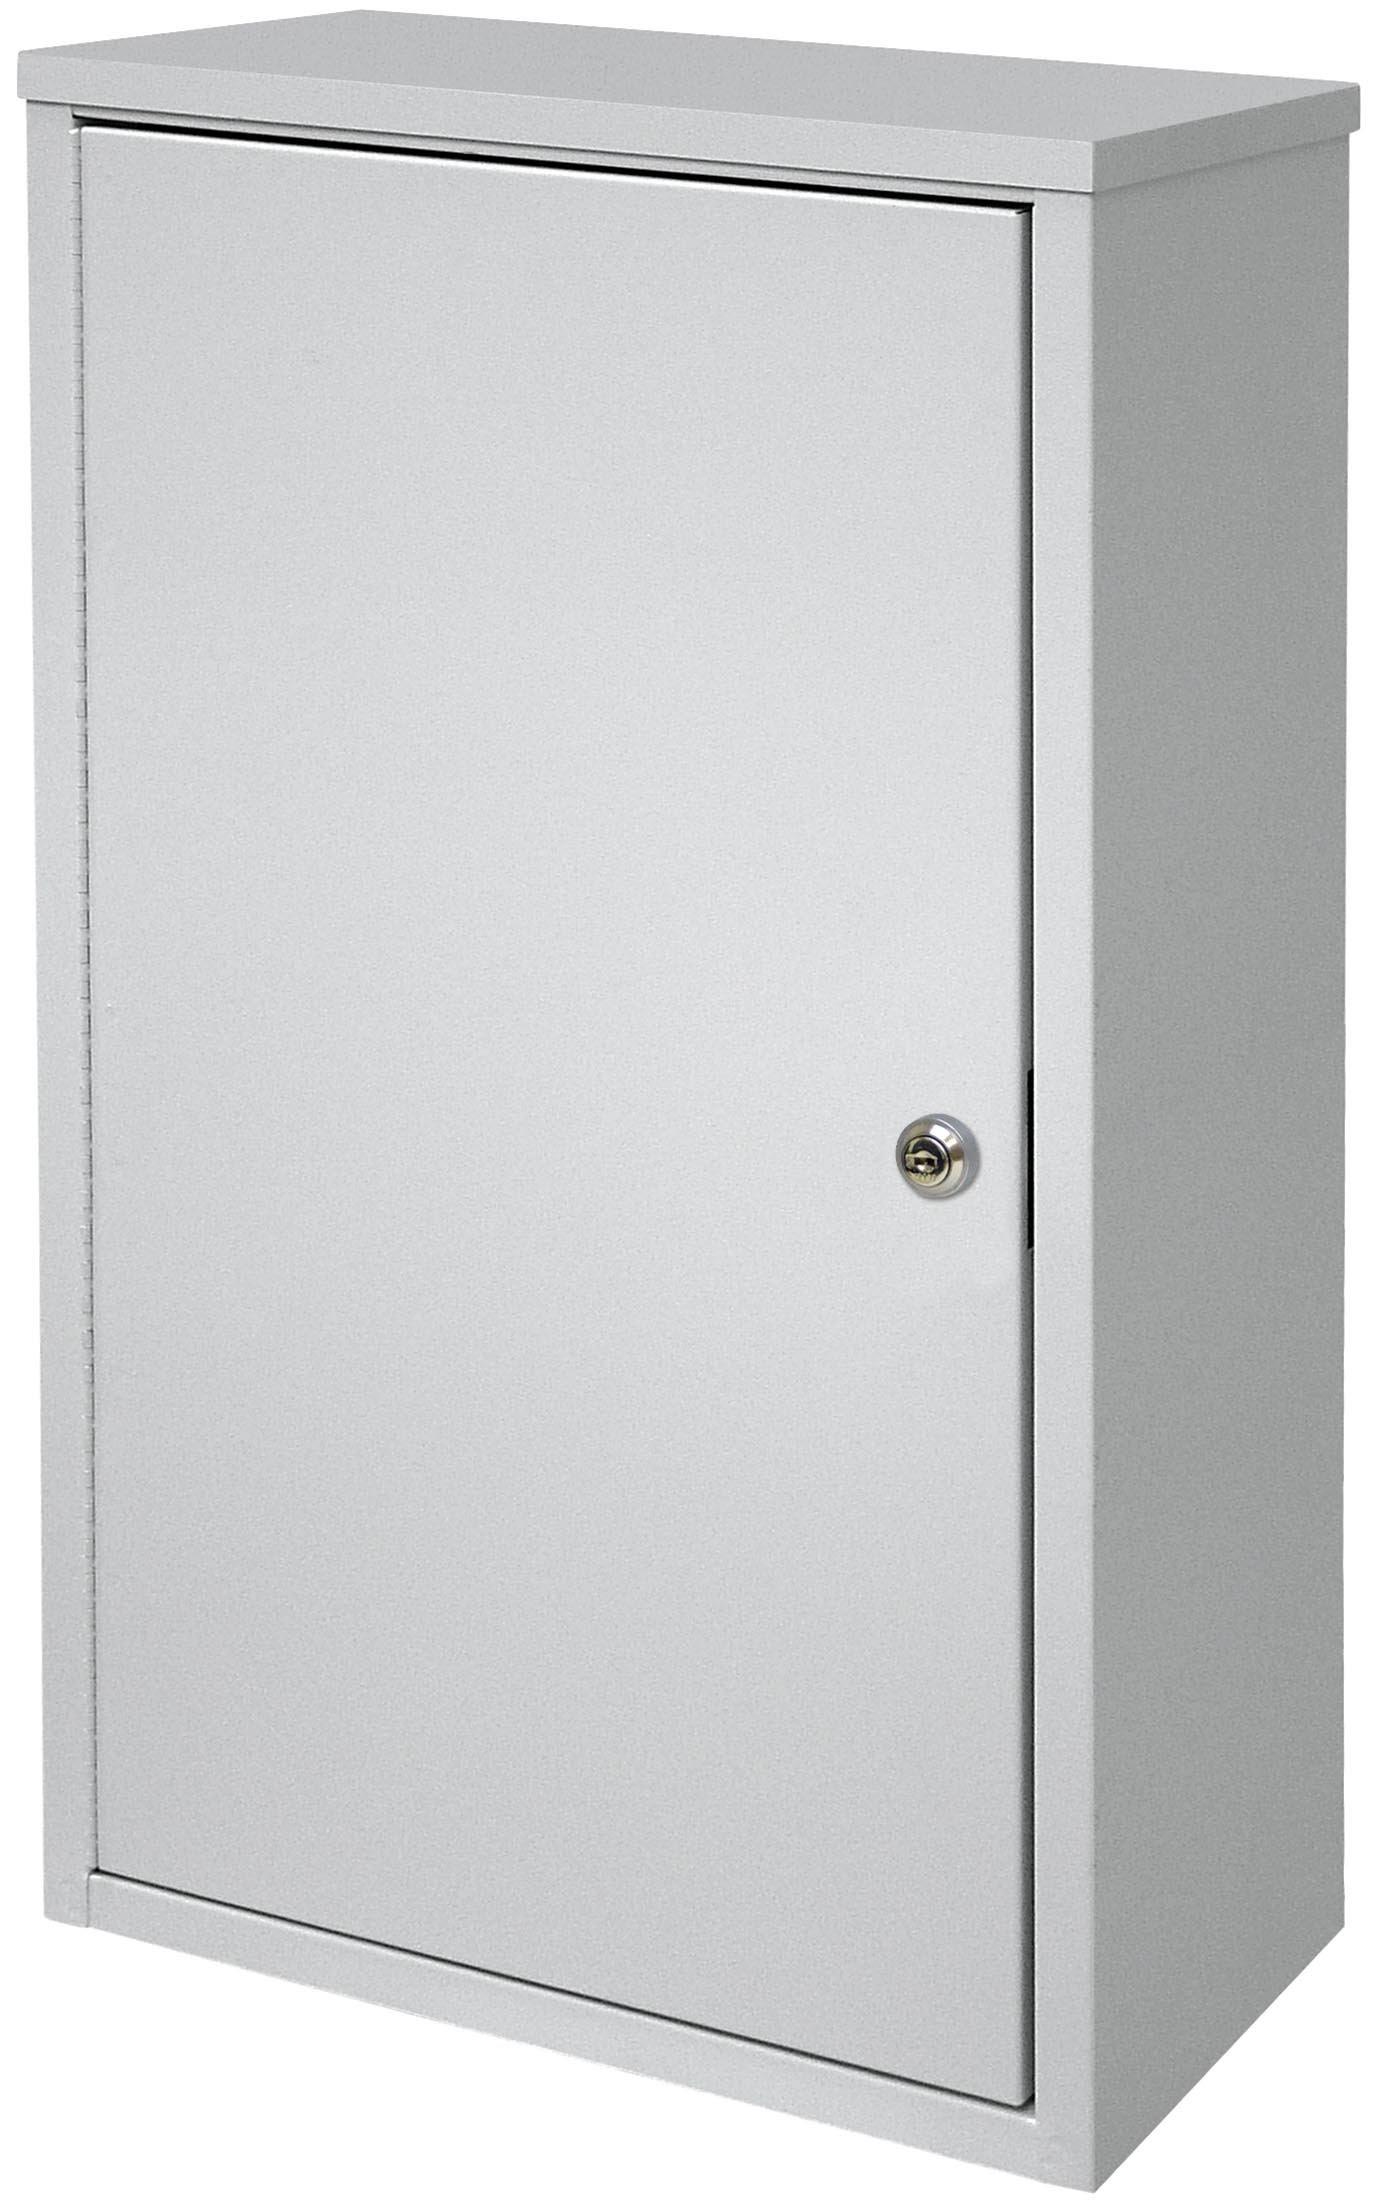 Large Wall Storage Cabinet - Light Grey